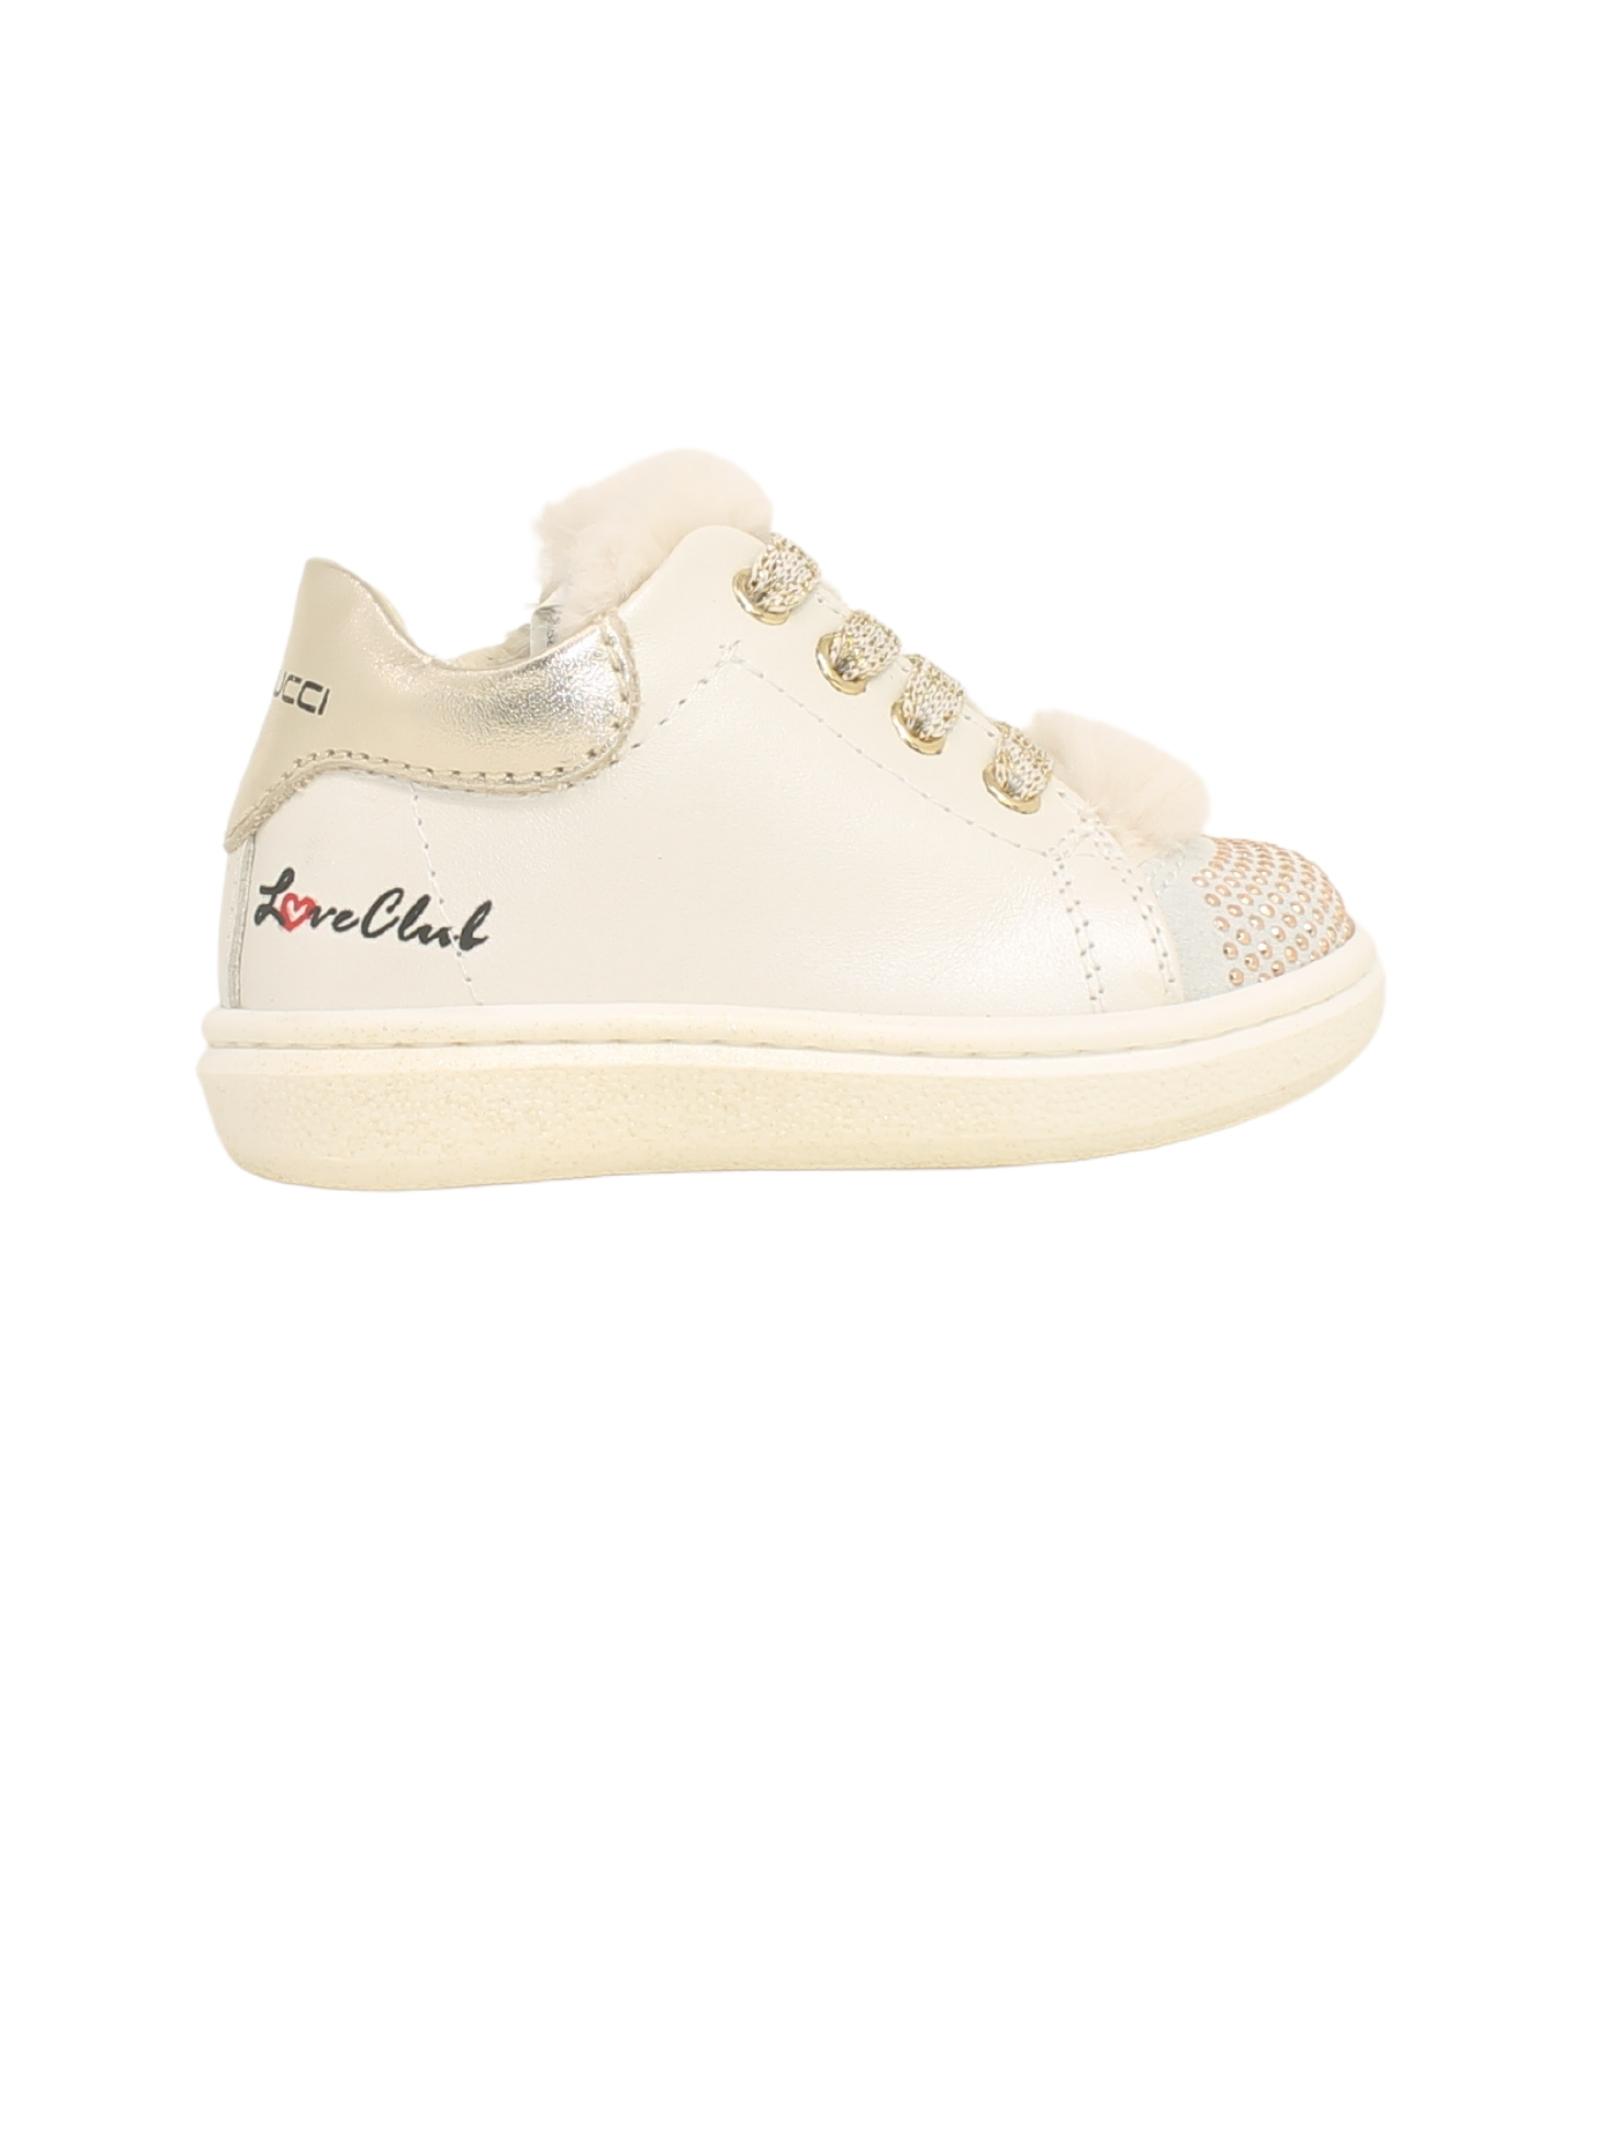 Girl's Eco-fur Sneakers BALDUCCI | Sneakers | MSPO3827AVORIO